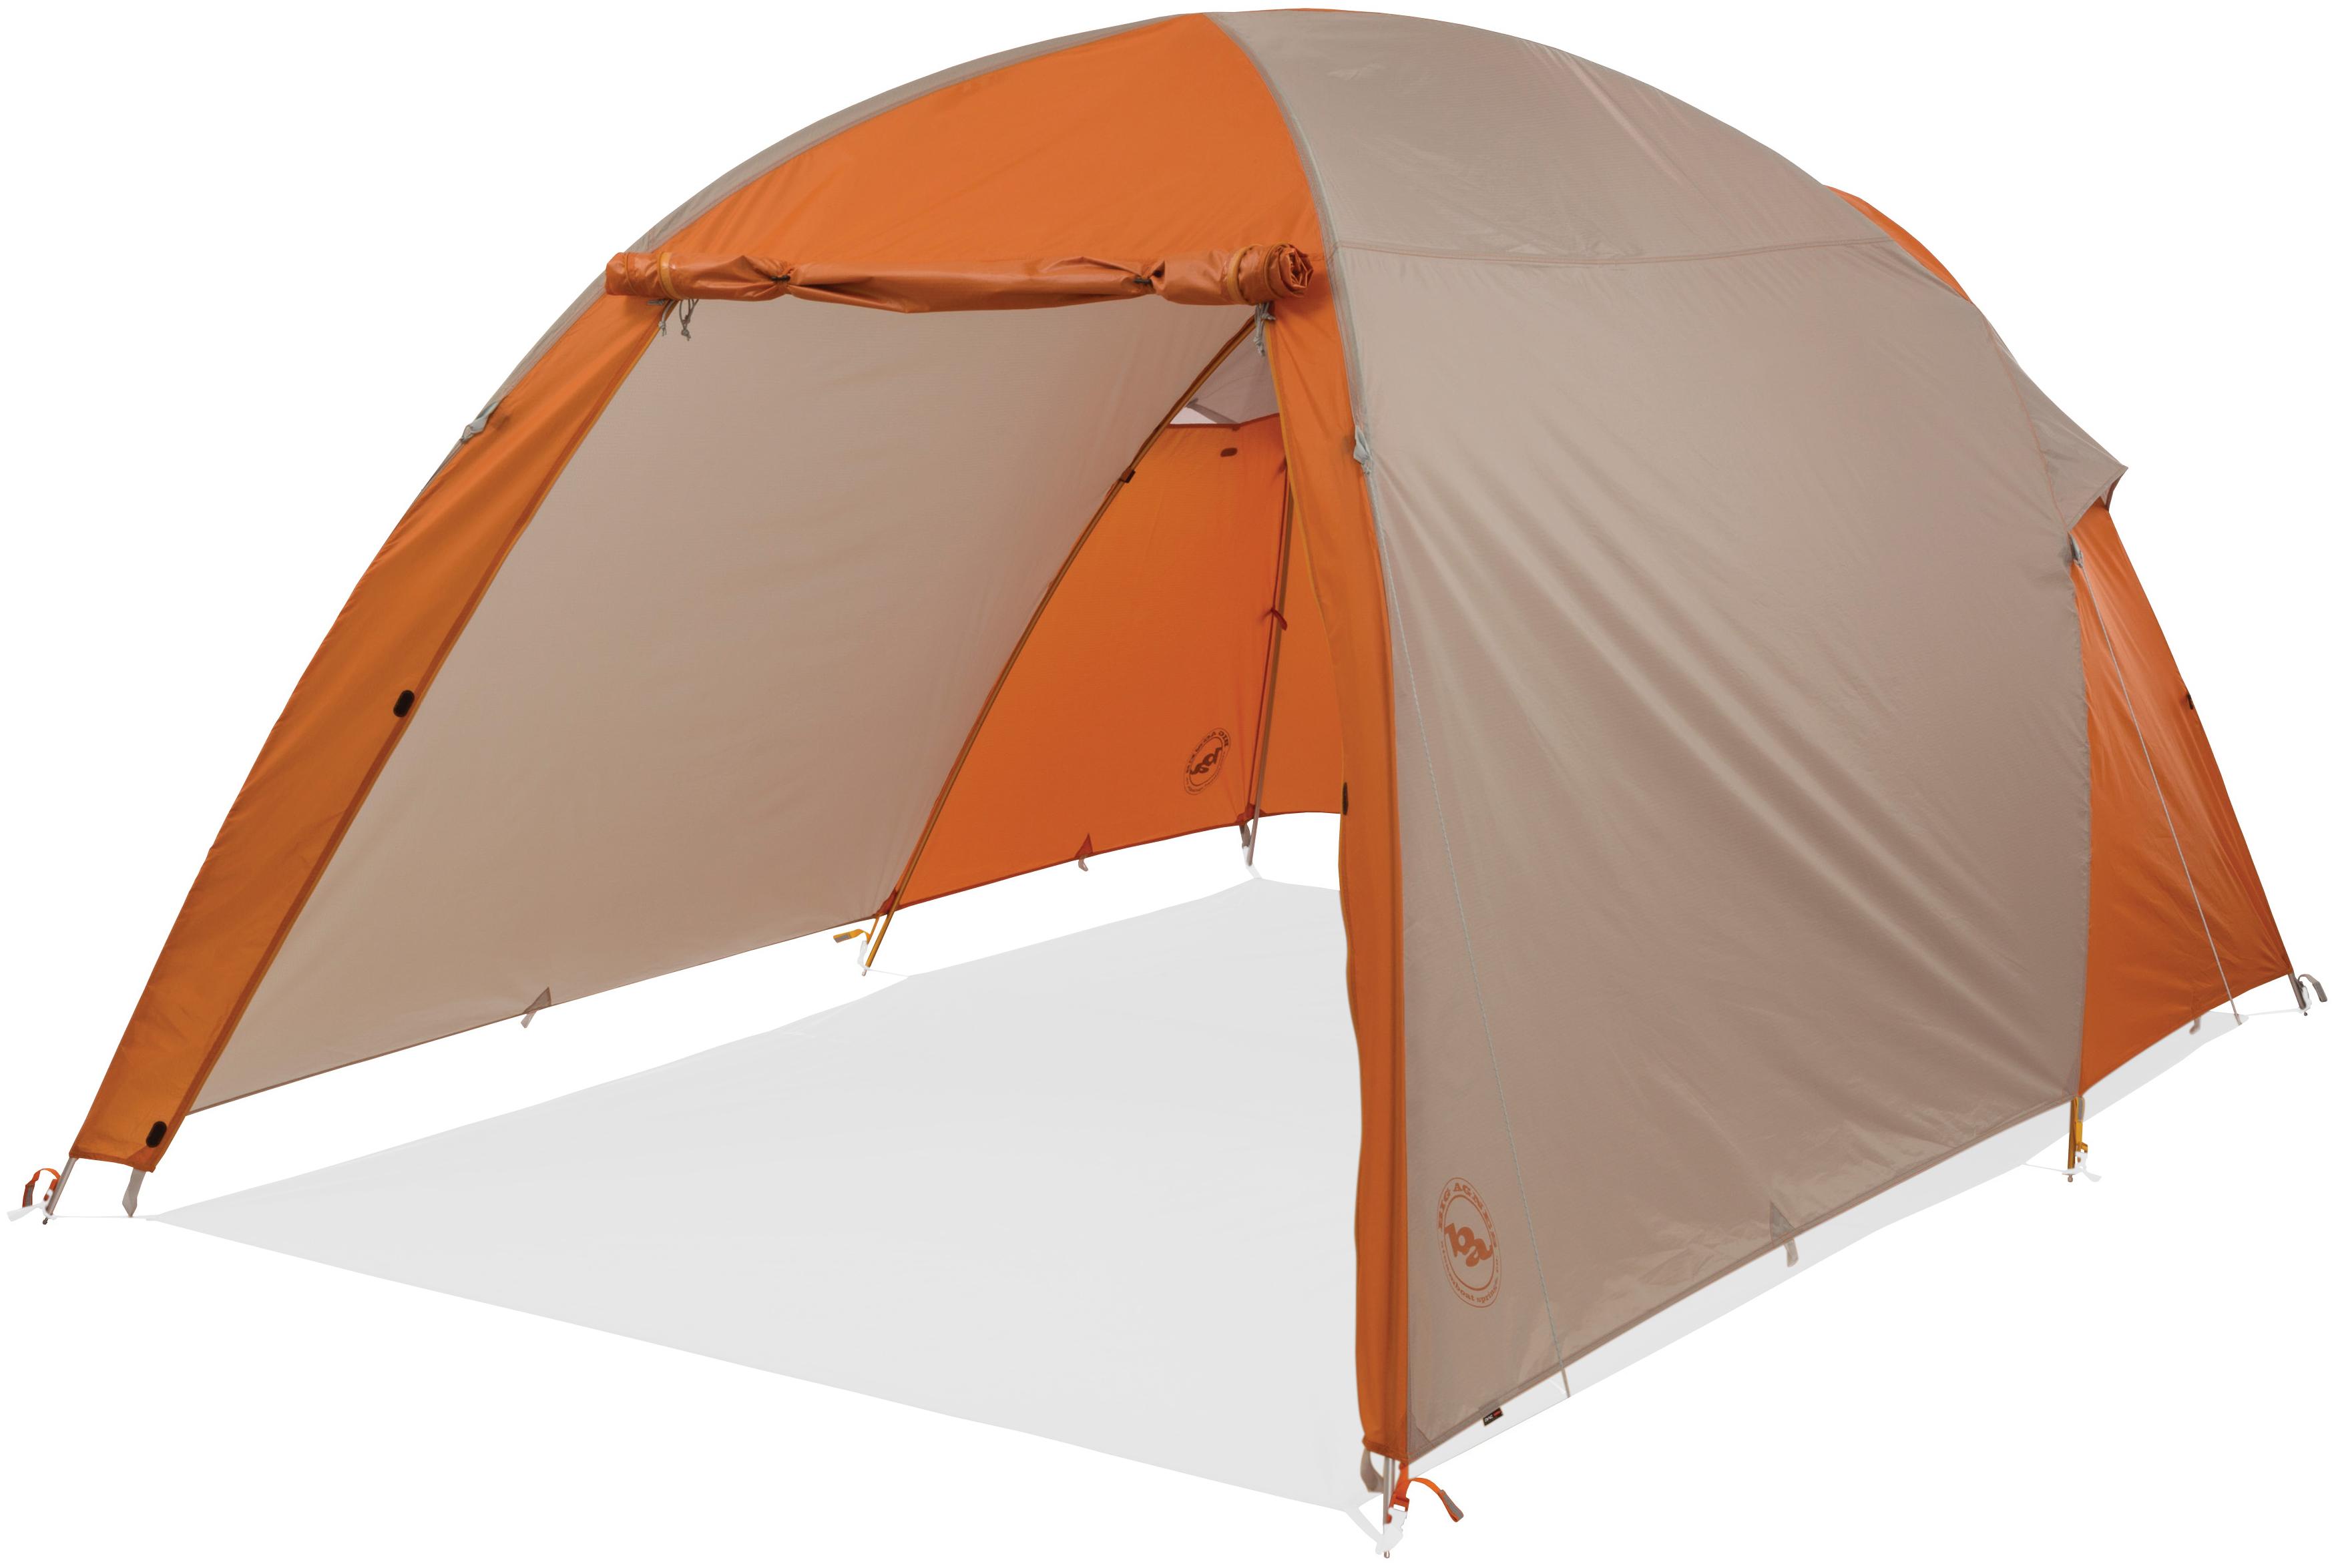 sc 1 st  MEC & Big Agnes Wyoming Trail 2 Camp Tent